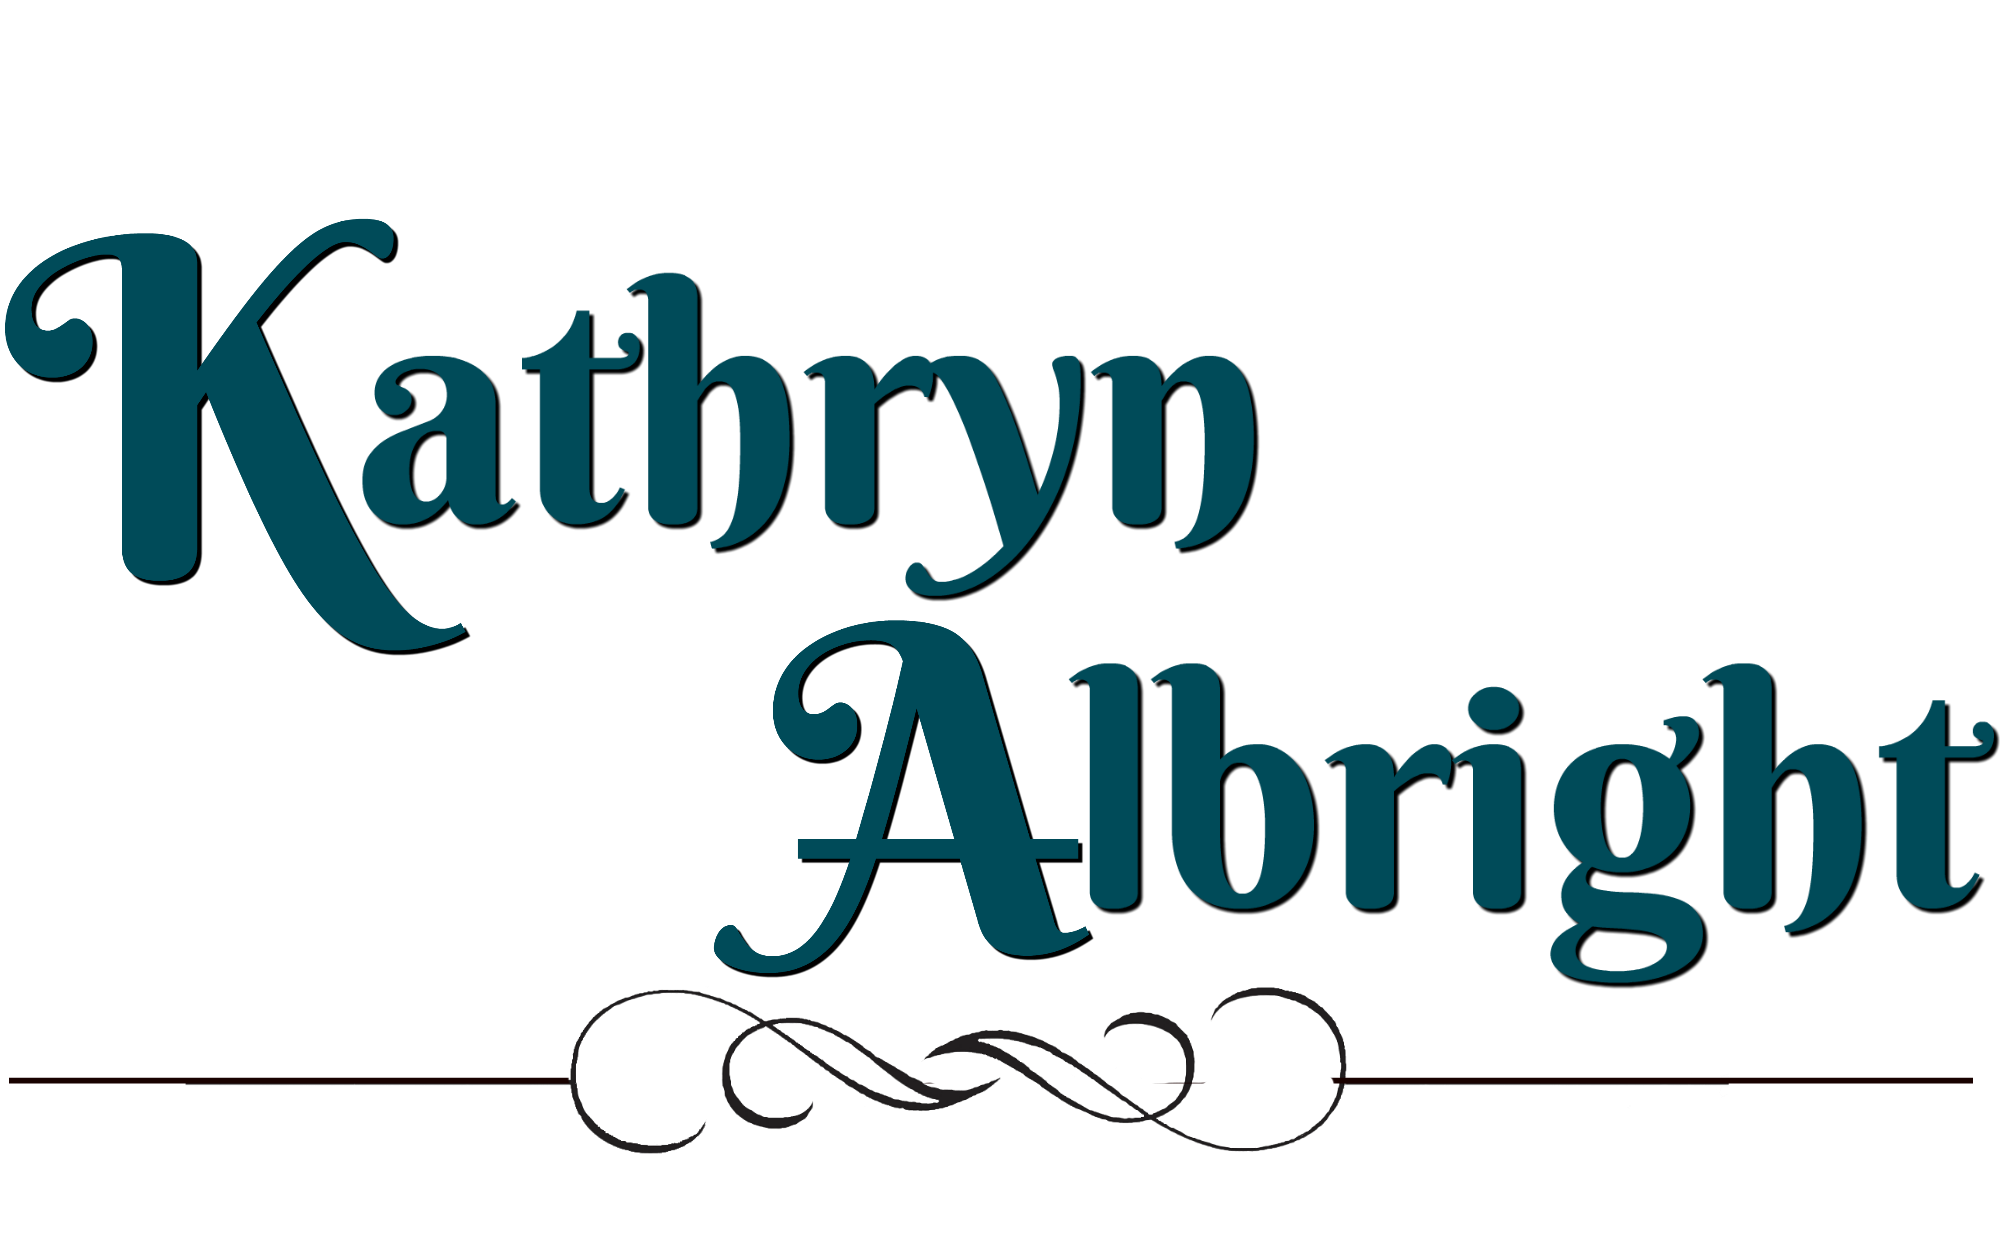 Kathryn Albright | Historical Romance Author